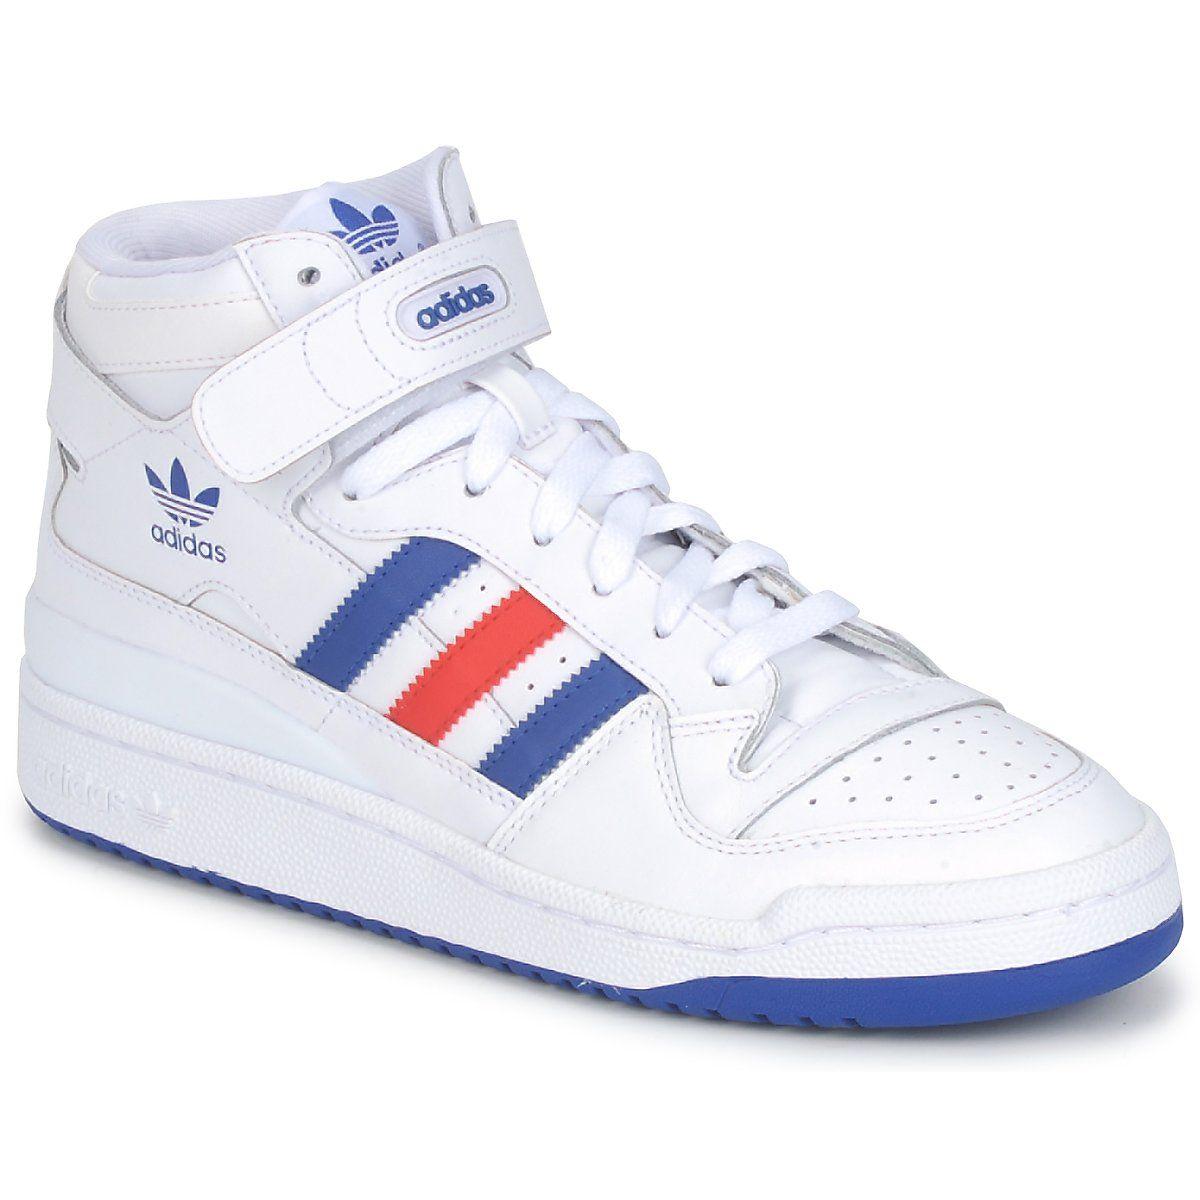 Ciao top formatori adidas originali metà bianco / blu / rosso forum libero